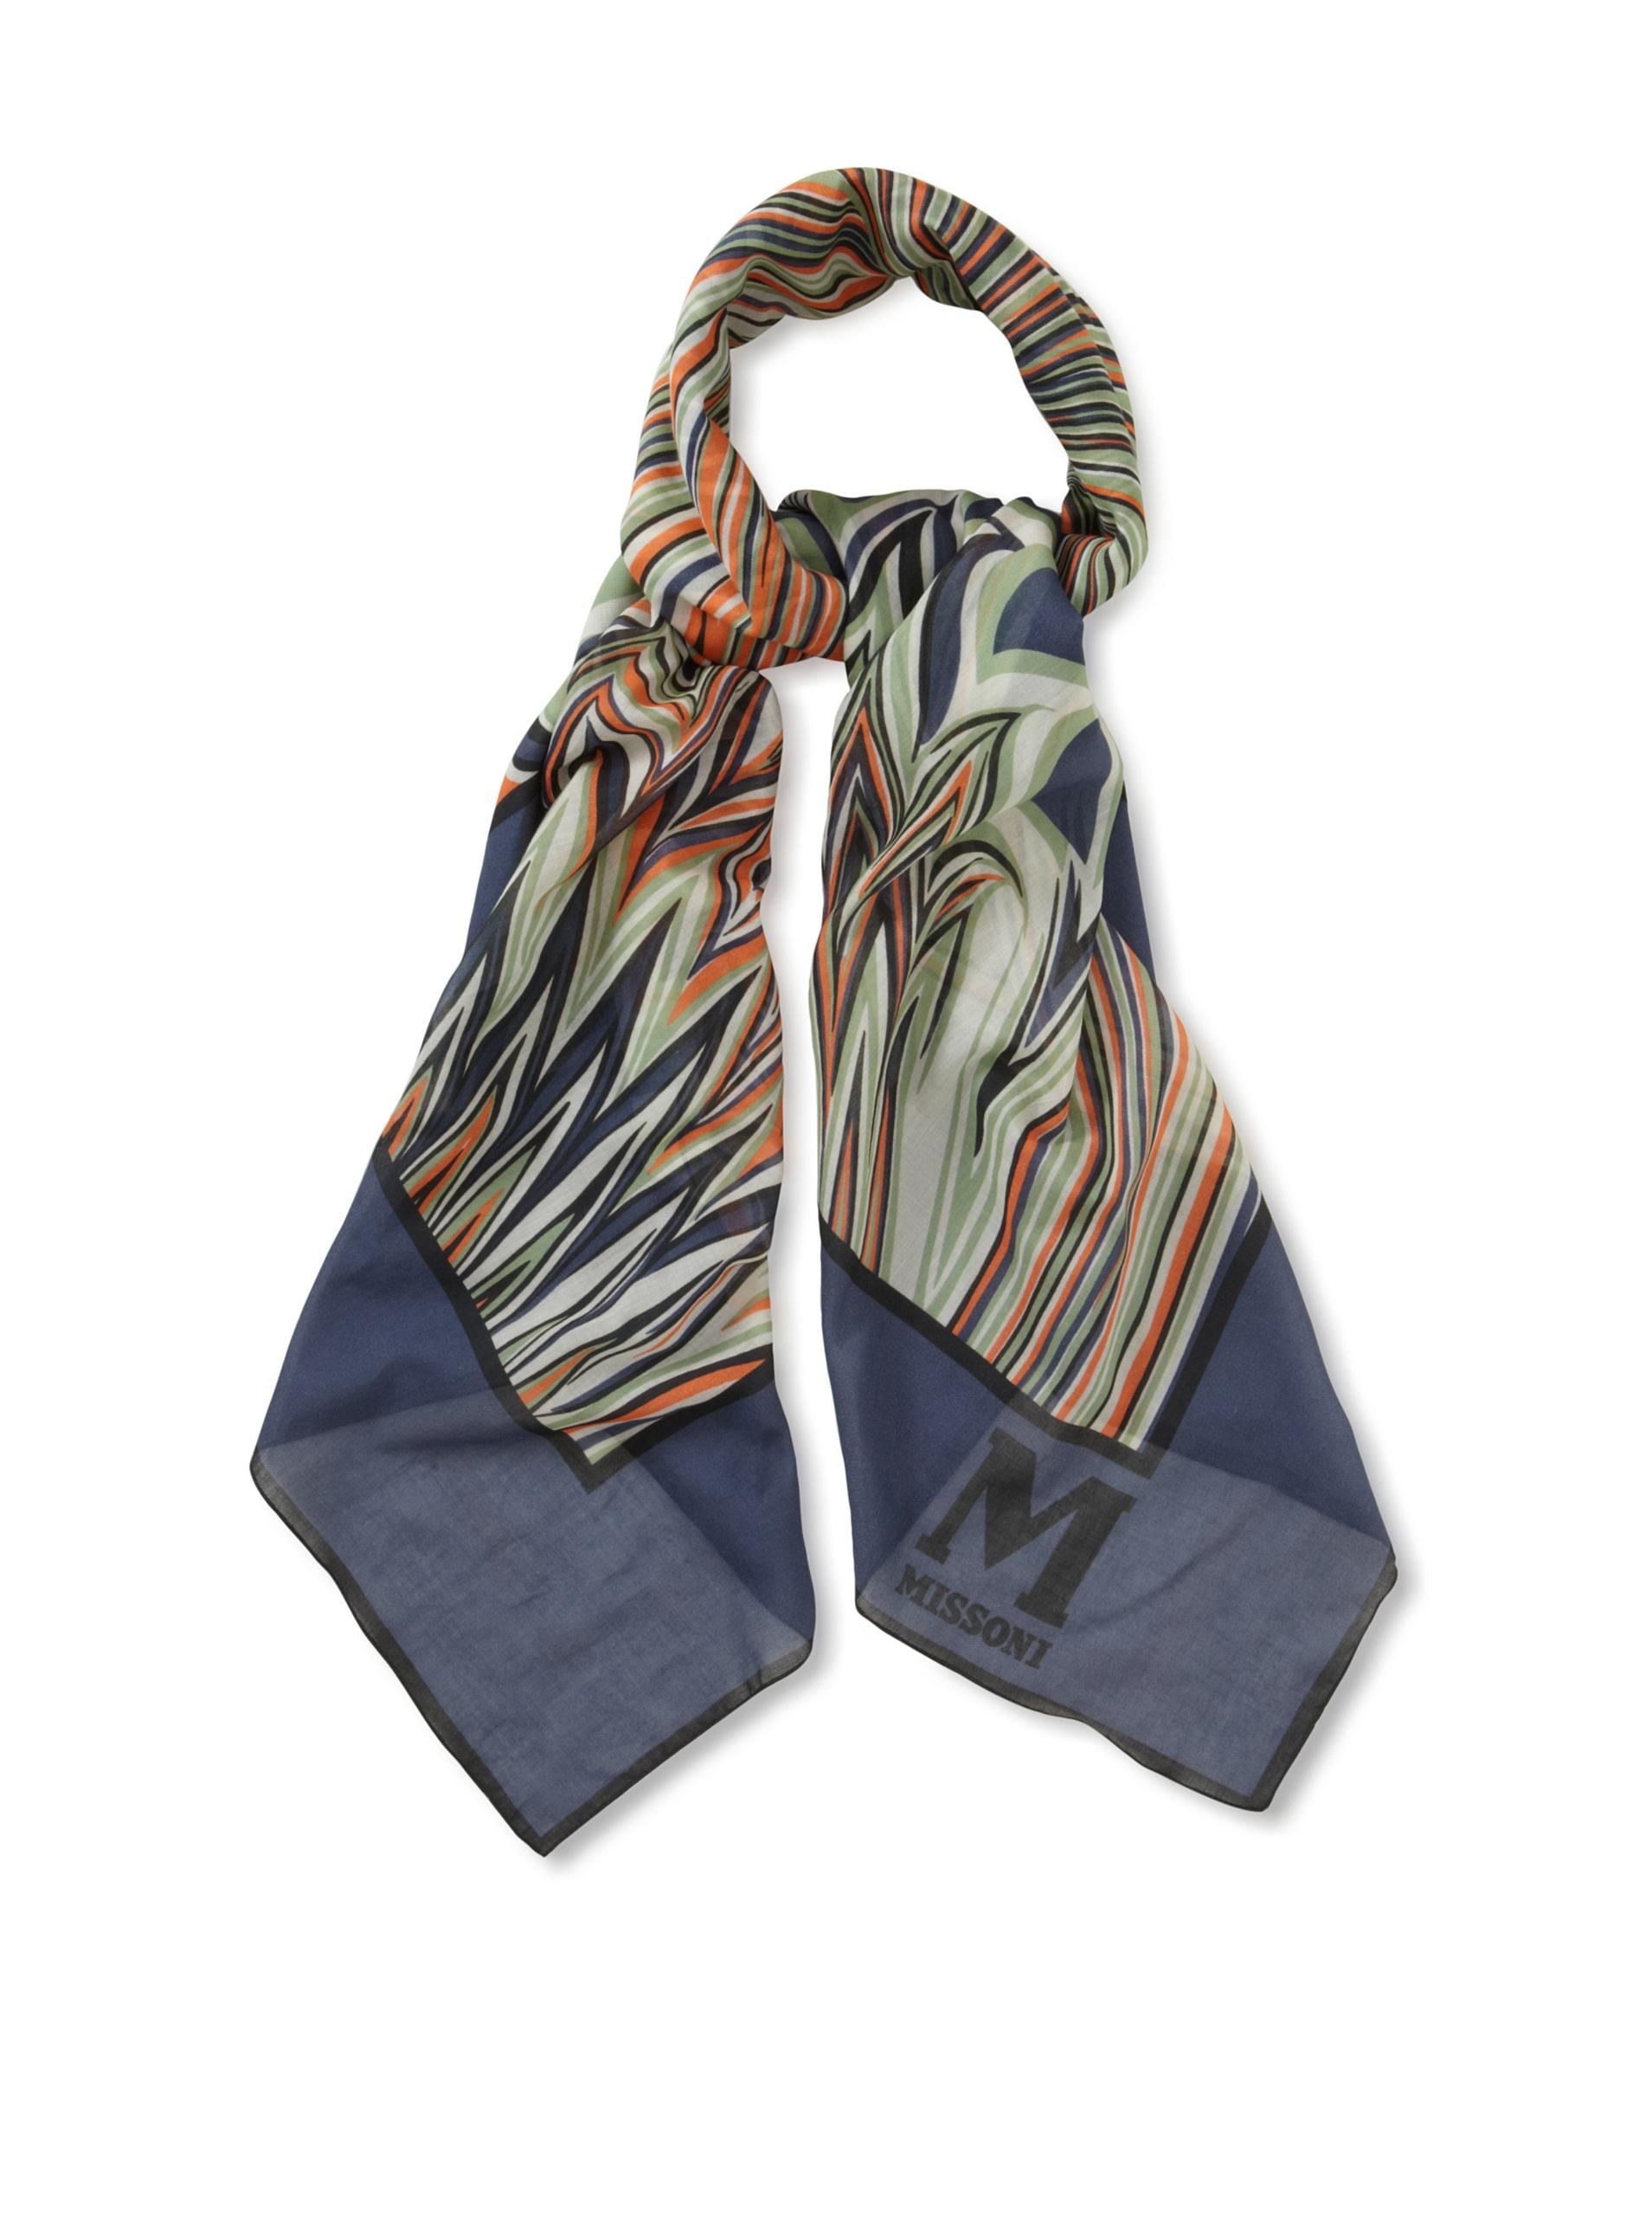 M Missoni Women's Printed Cotton Scarf, Multicolored, One Size